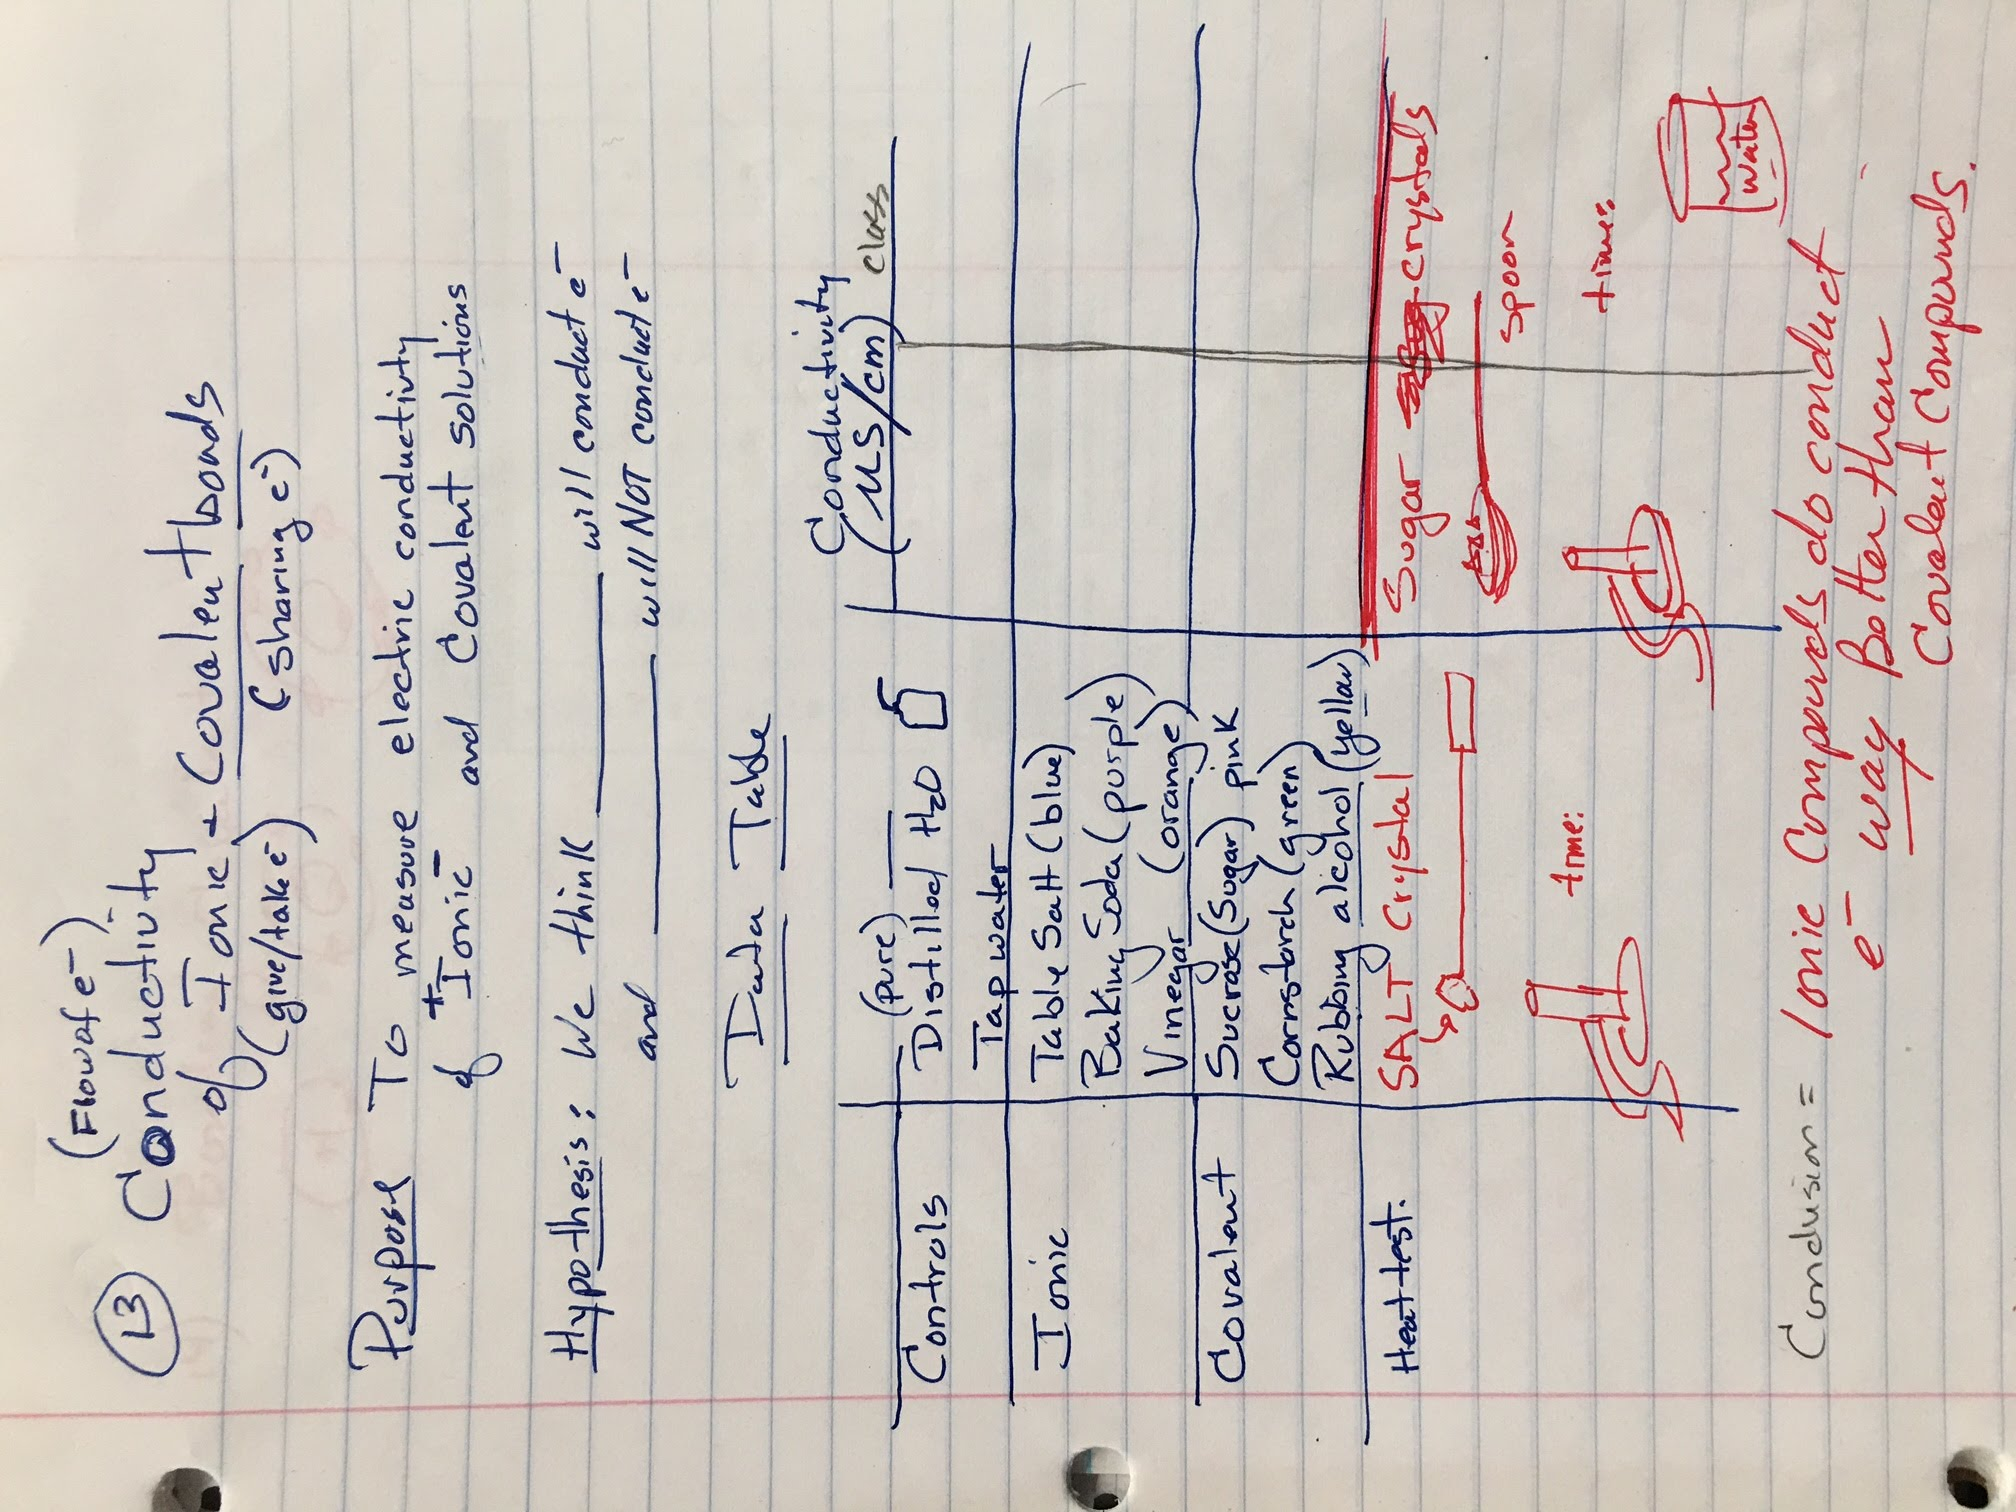 Nova Making Stuff Smarter Worksheet Answers